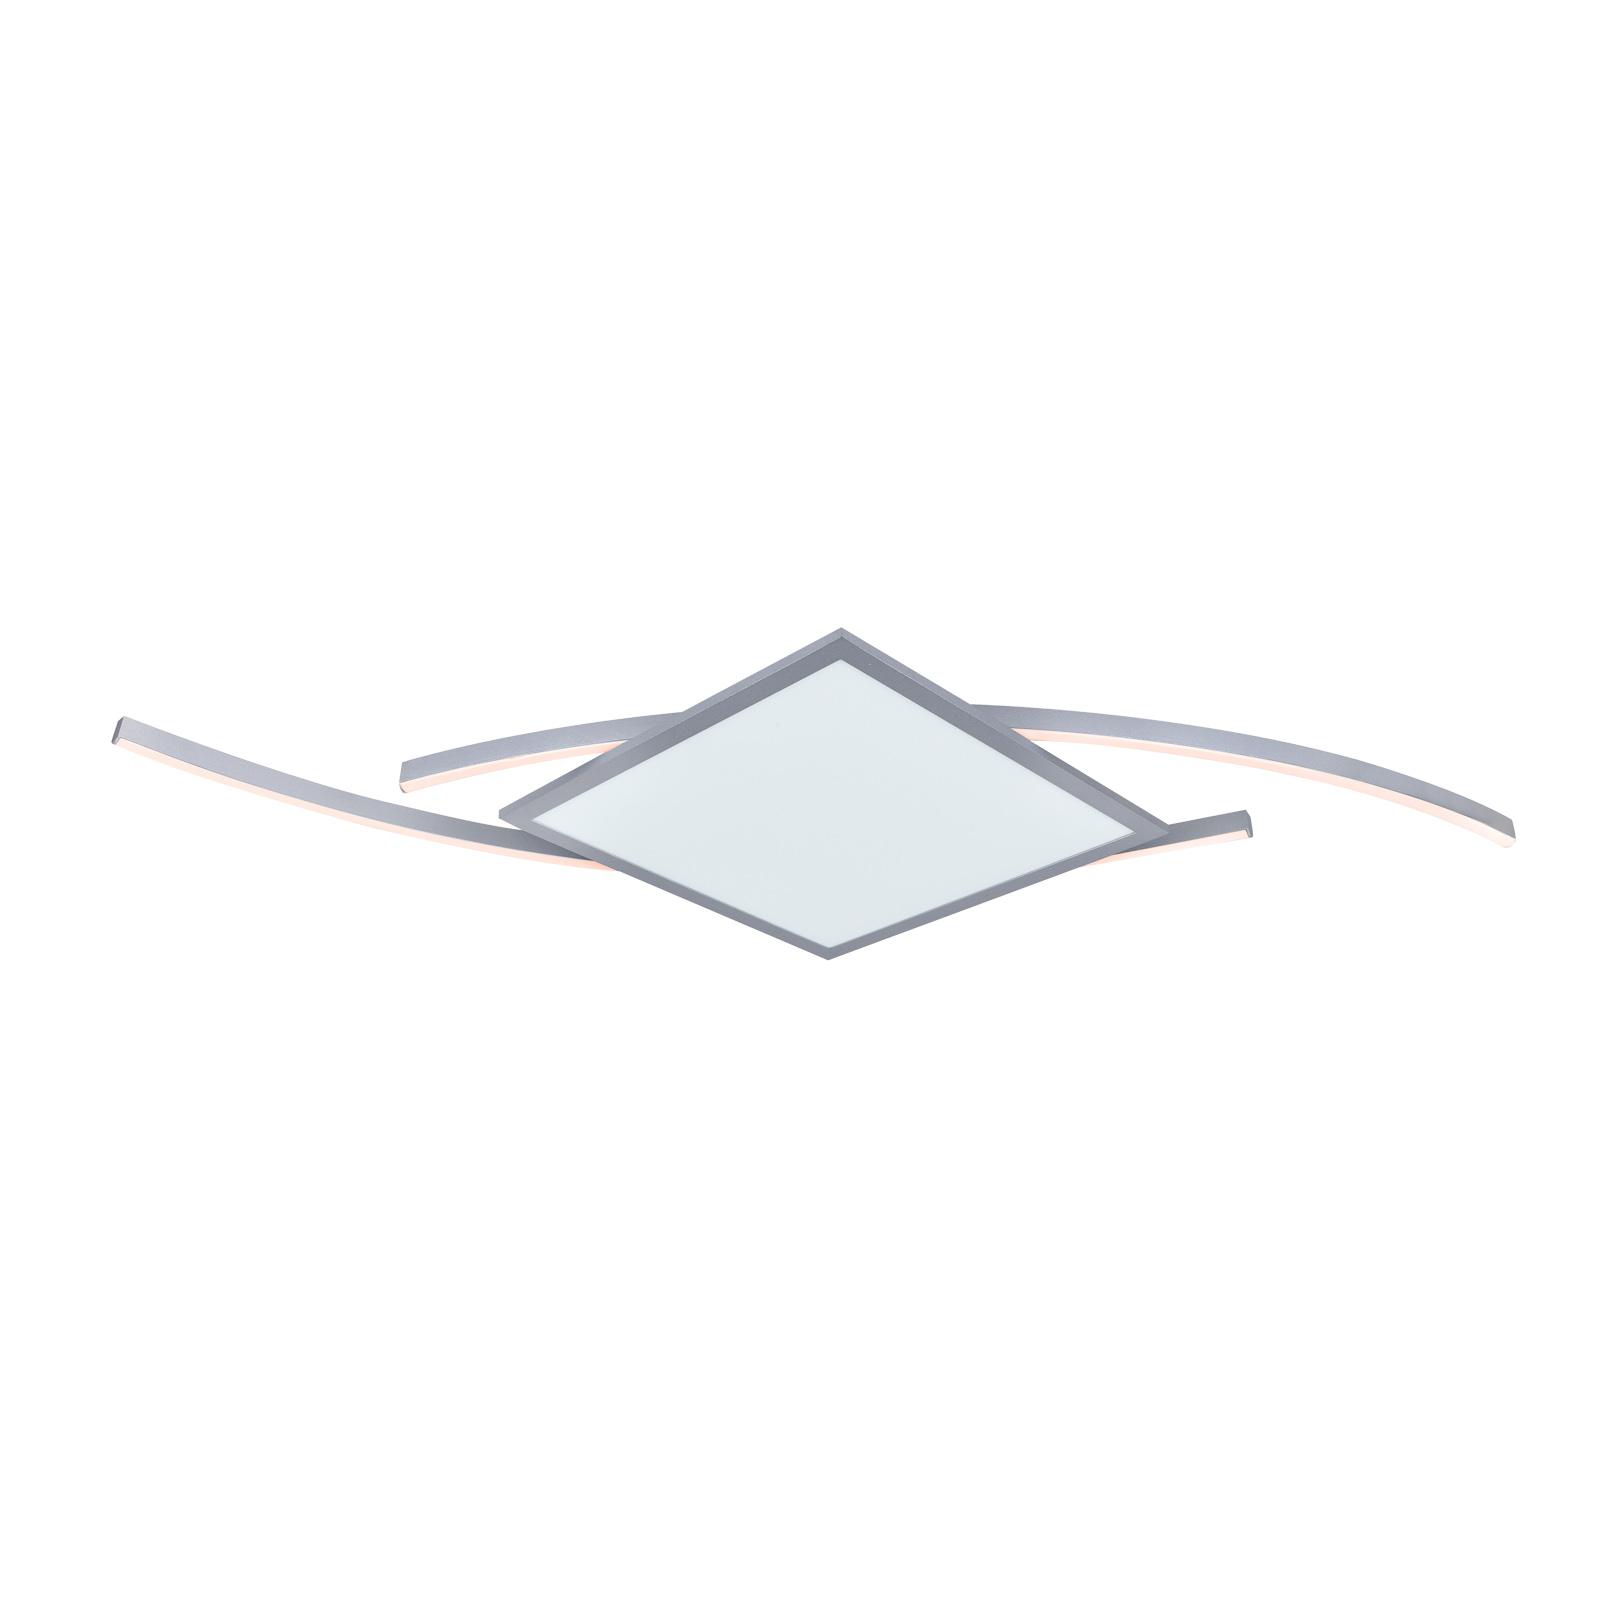 Lucande Tiaro lampa sufitowa LED kątowa 56,6cm CCT